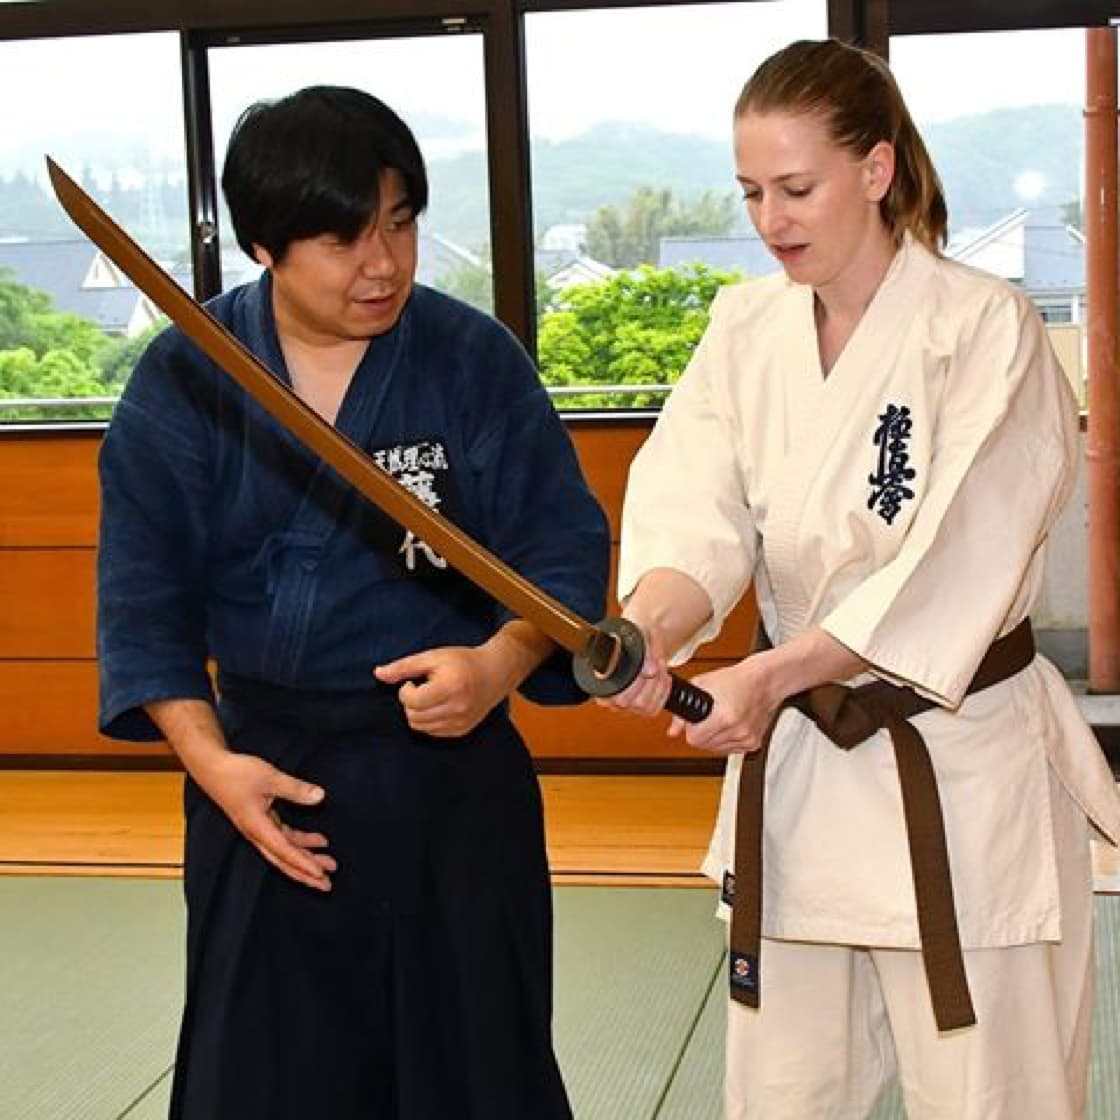 Kyokushin and Katana